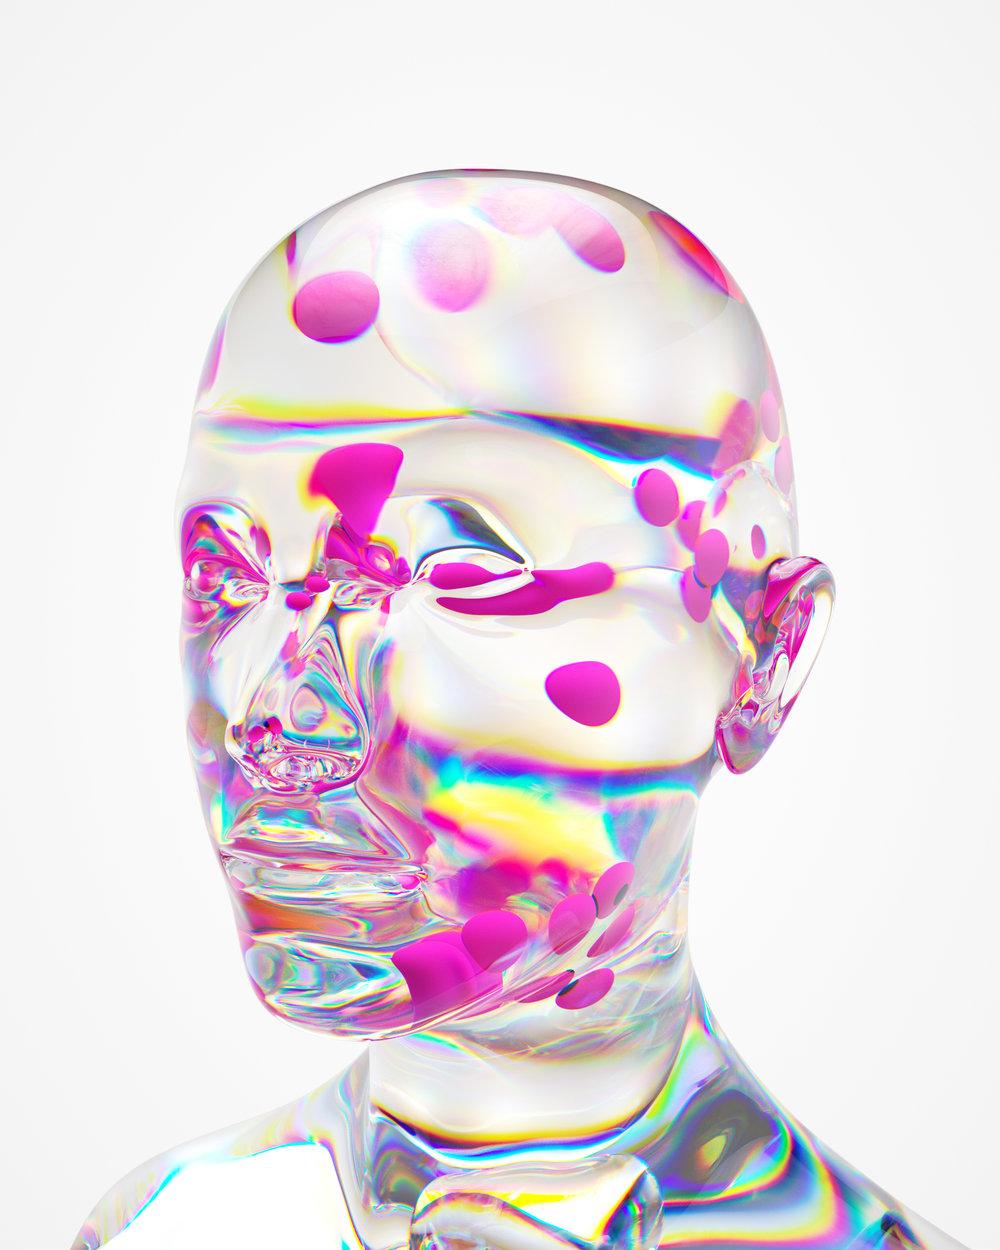 [20-11-17] - Glassandra.jpg